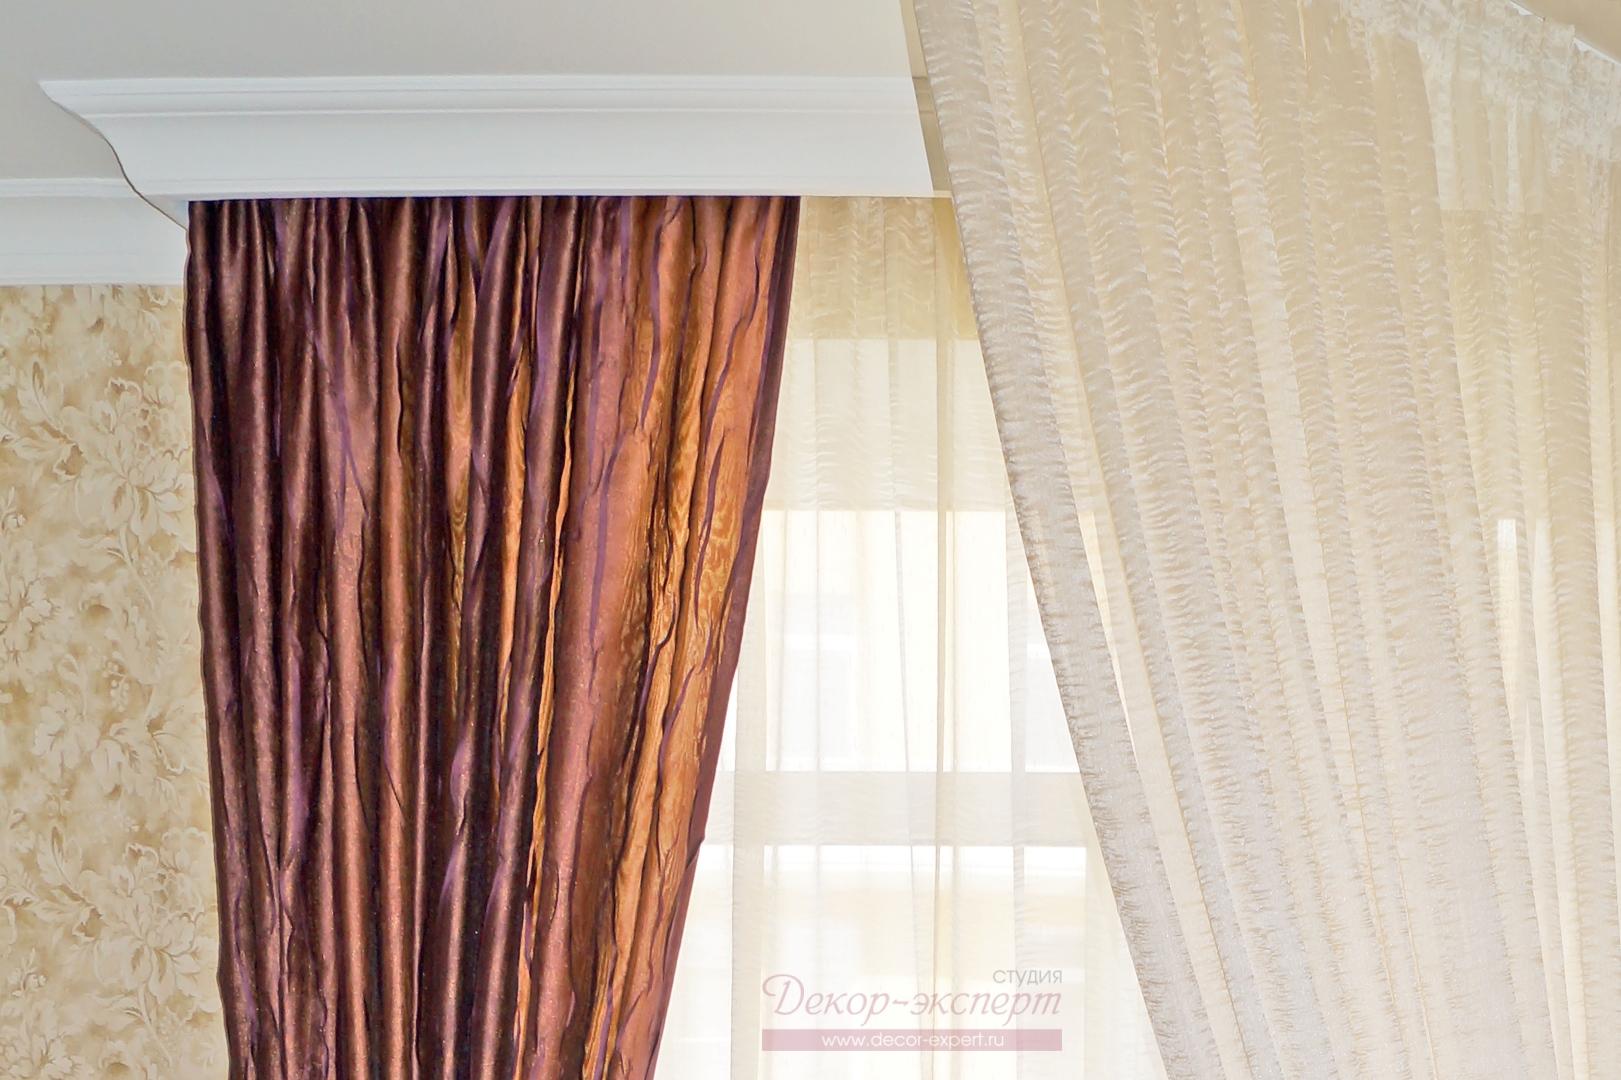 Фрагмент-штор и балдахина для спальни